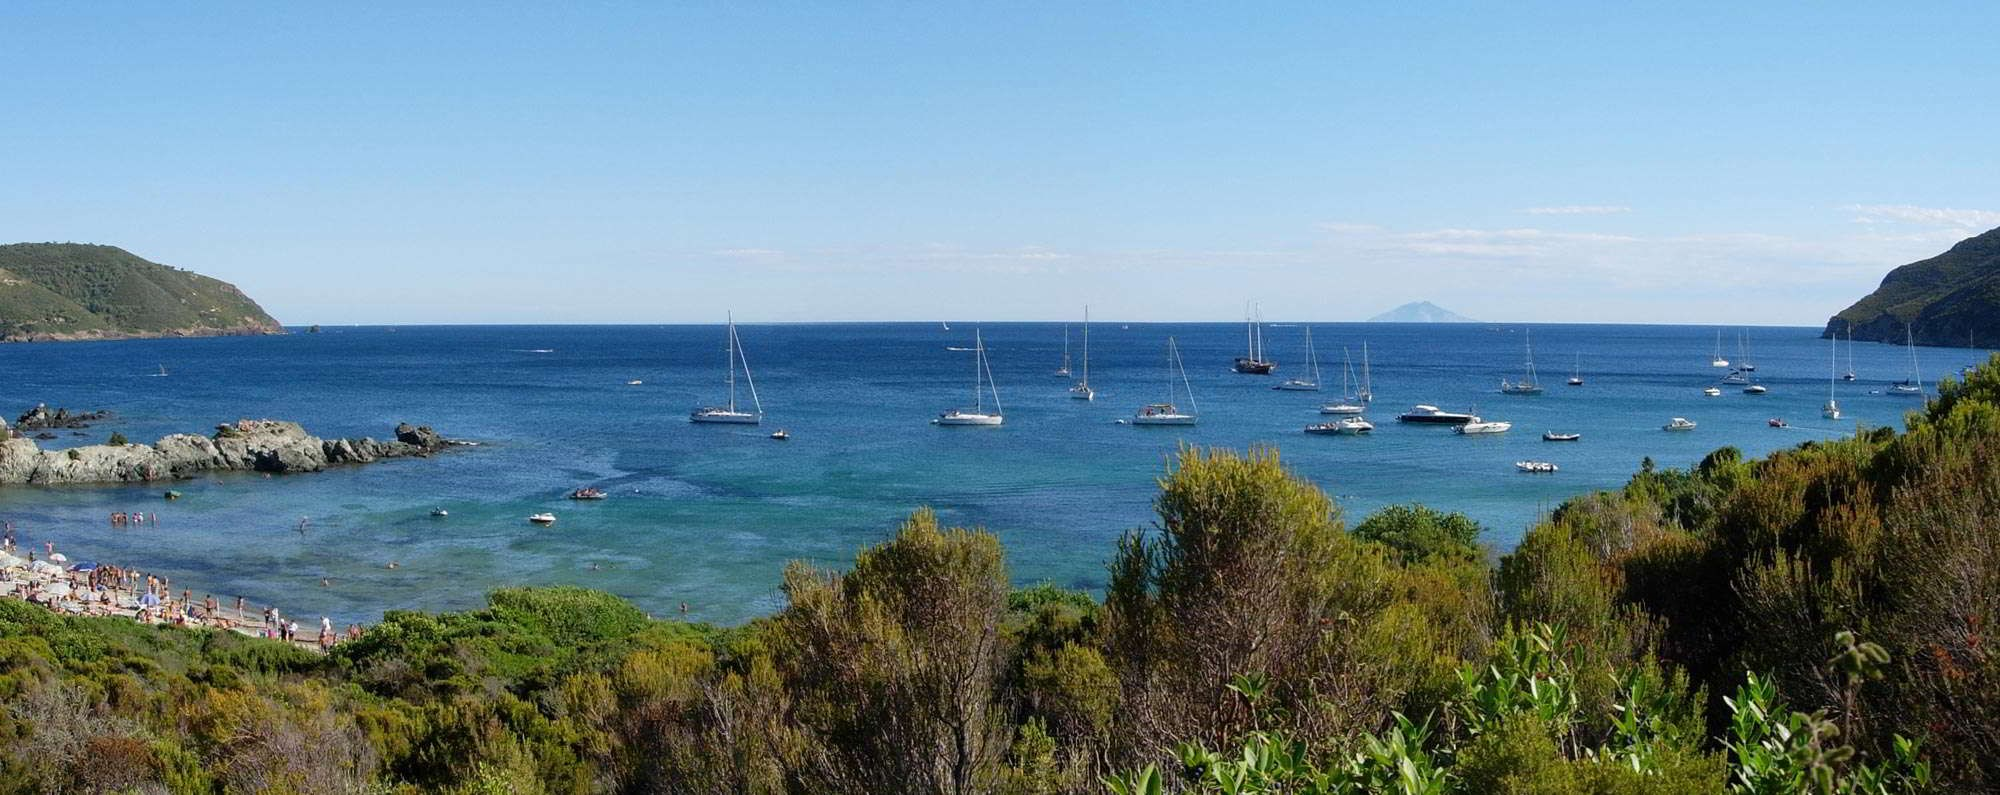 Yachtcharter Elba